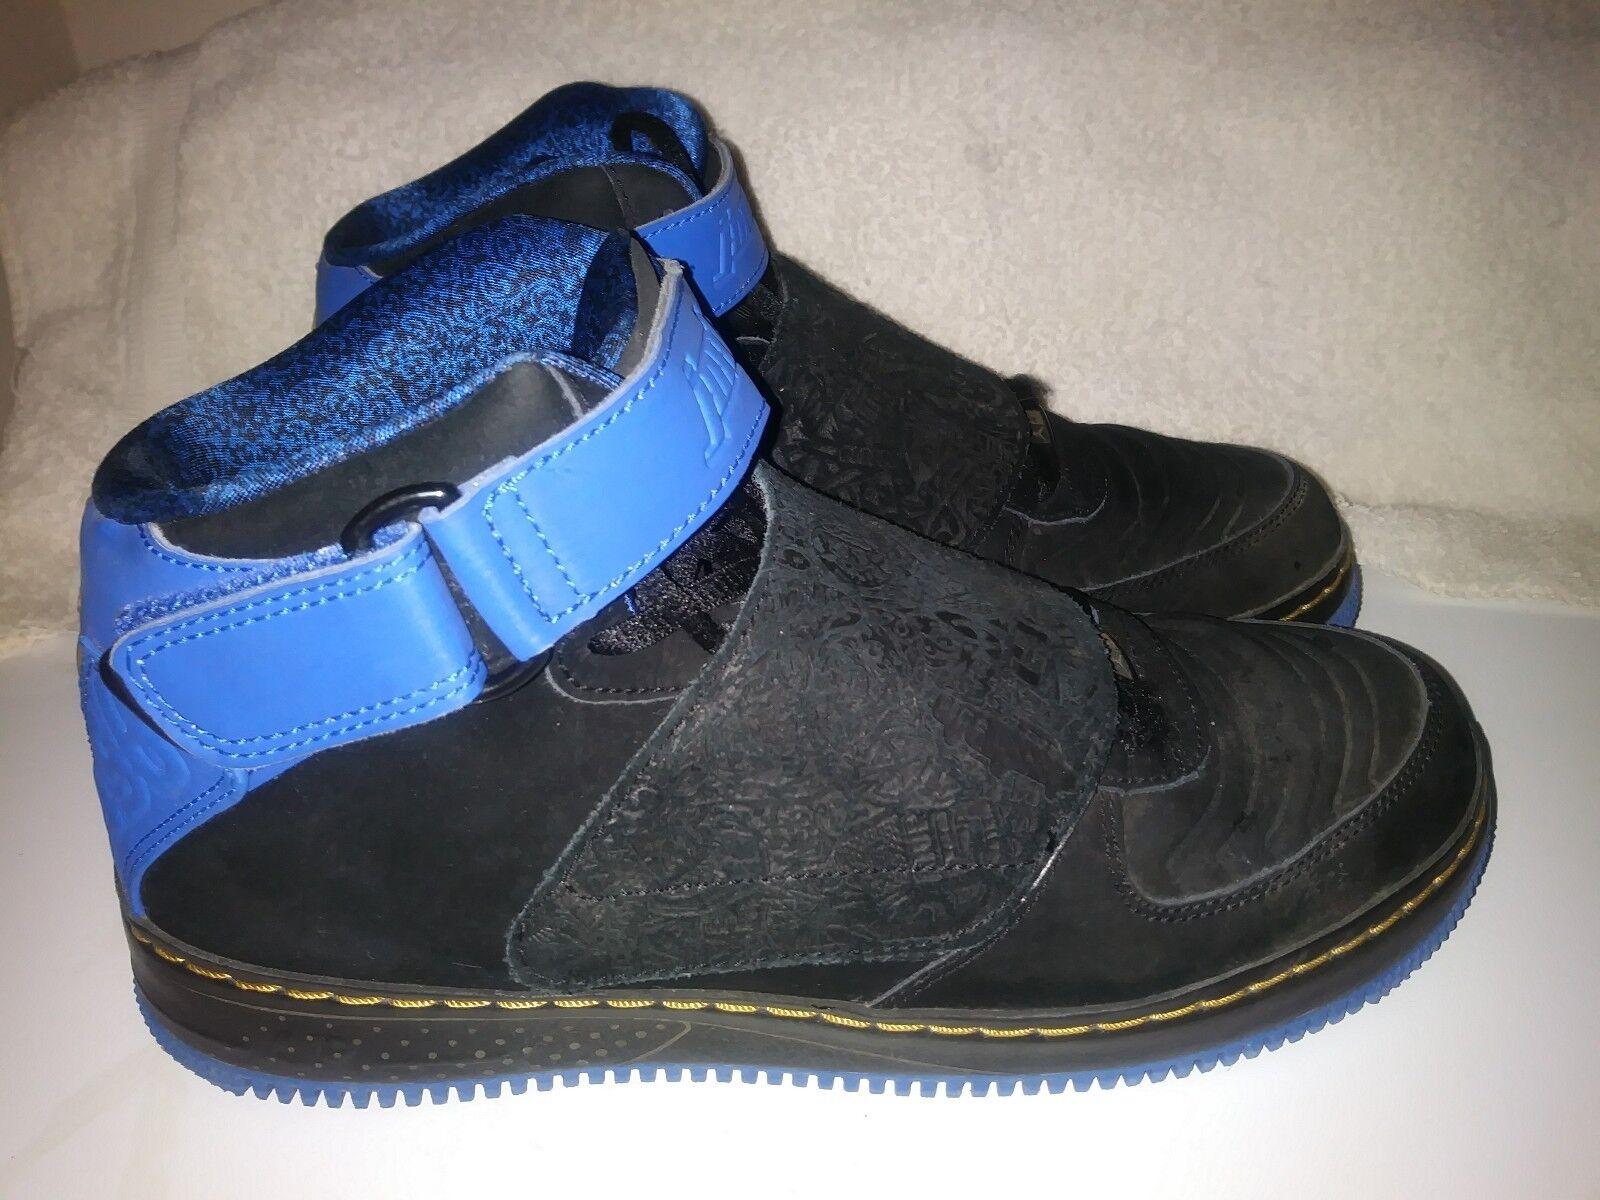 Nike Air Jordan AJF negro 20 azul noche y negro AJF comodo 0b0d98